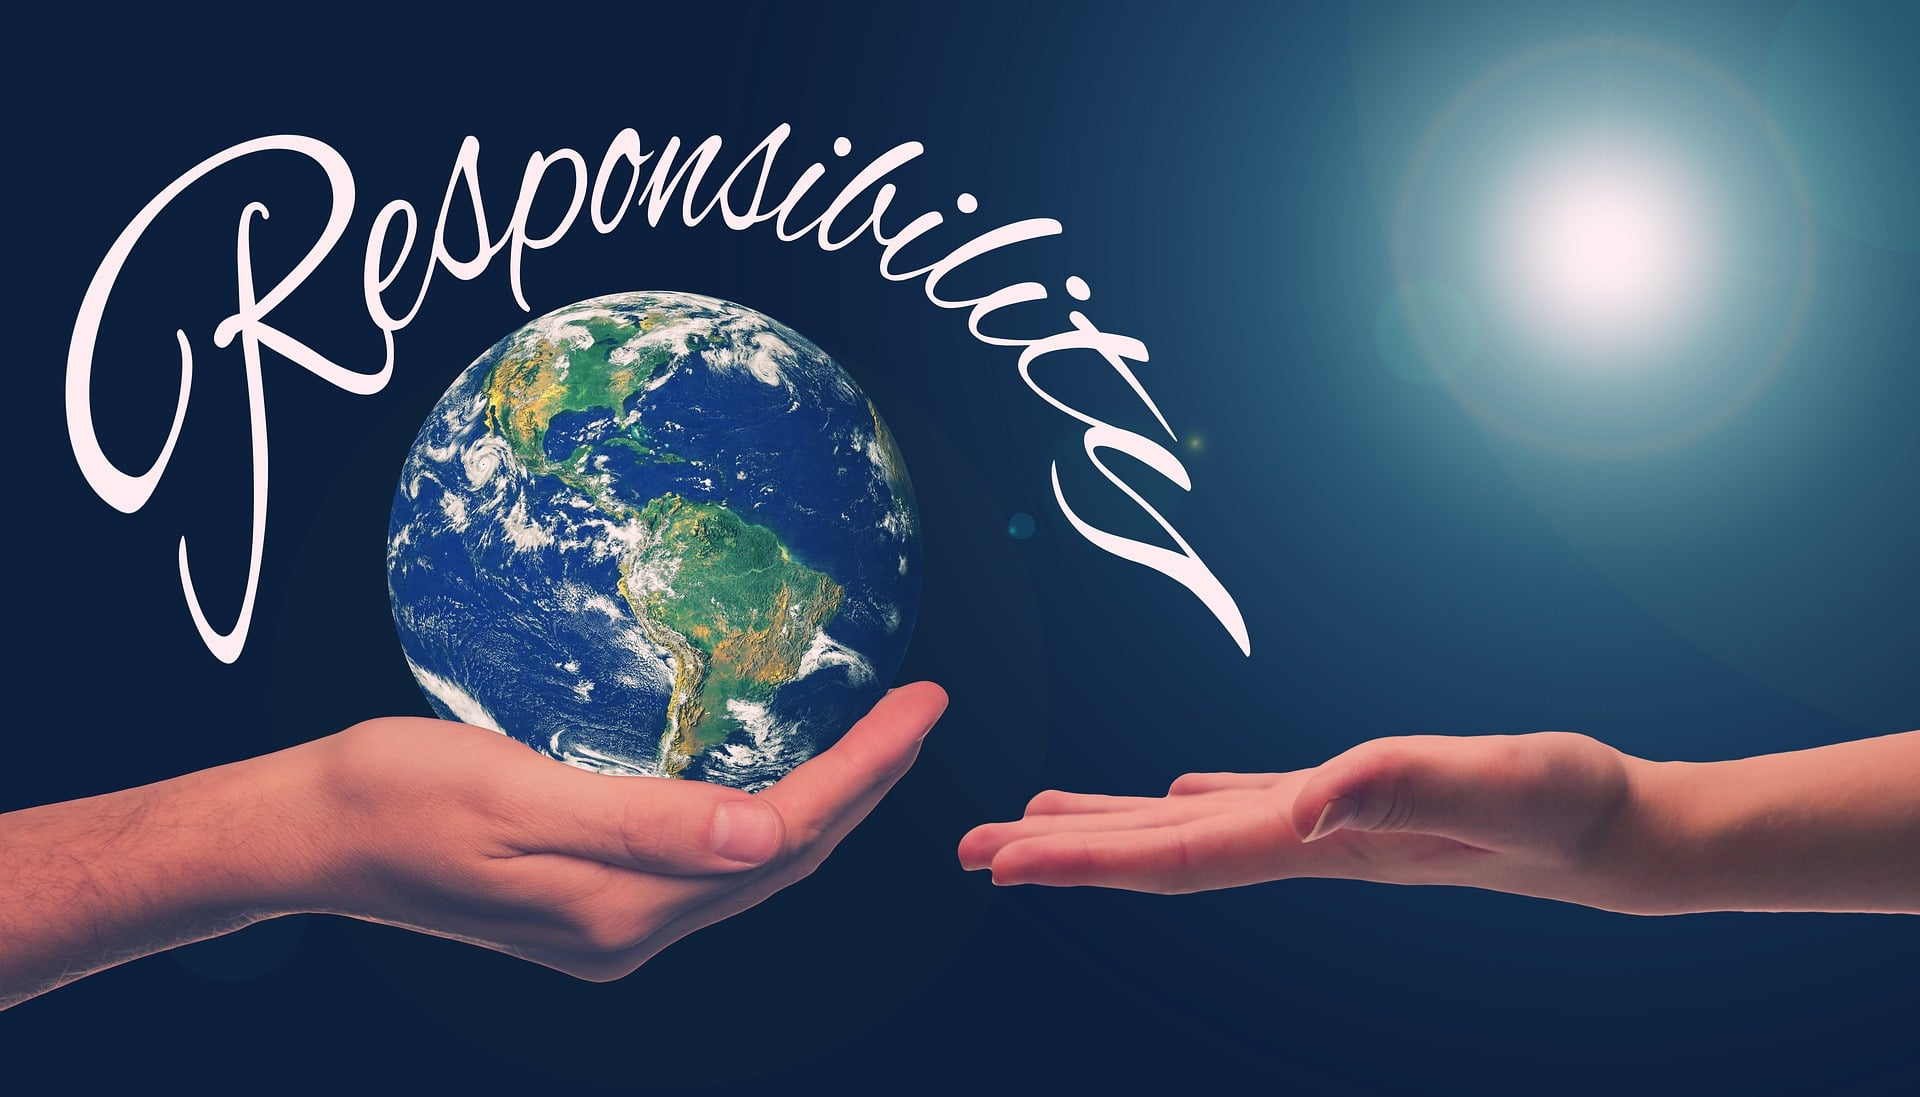 Hände Responsibility